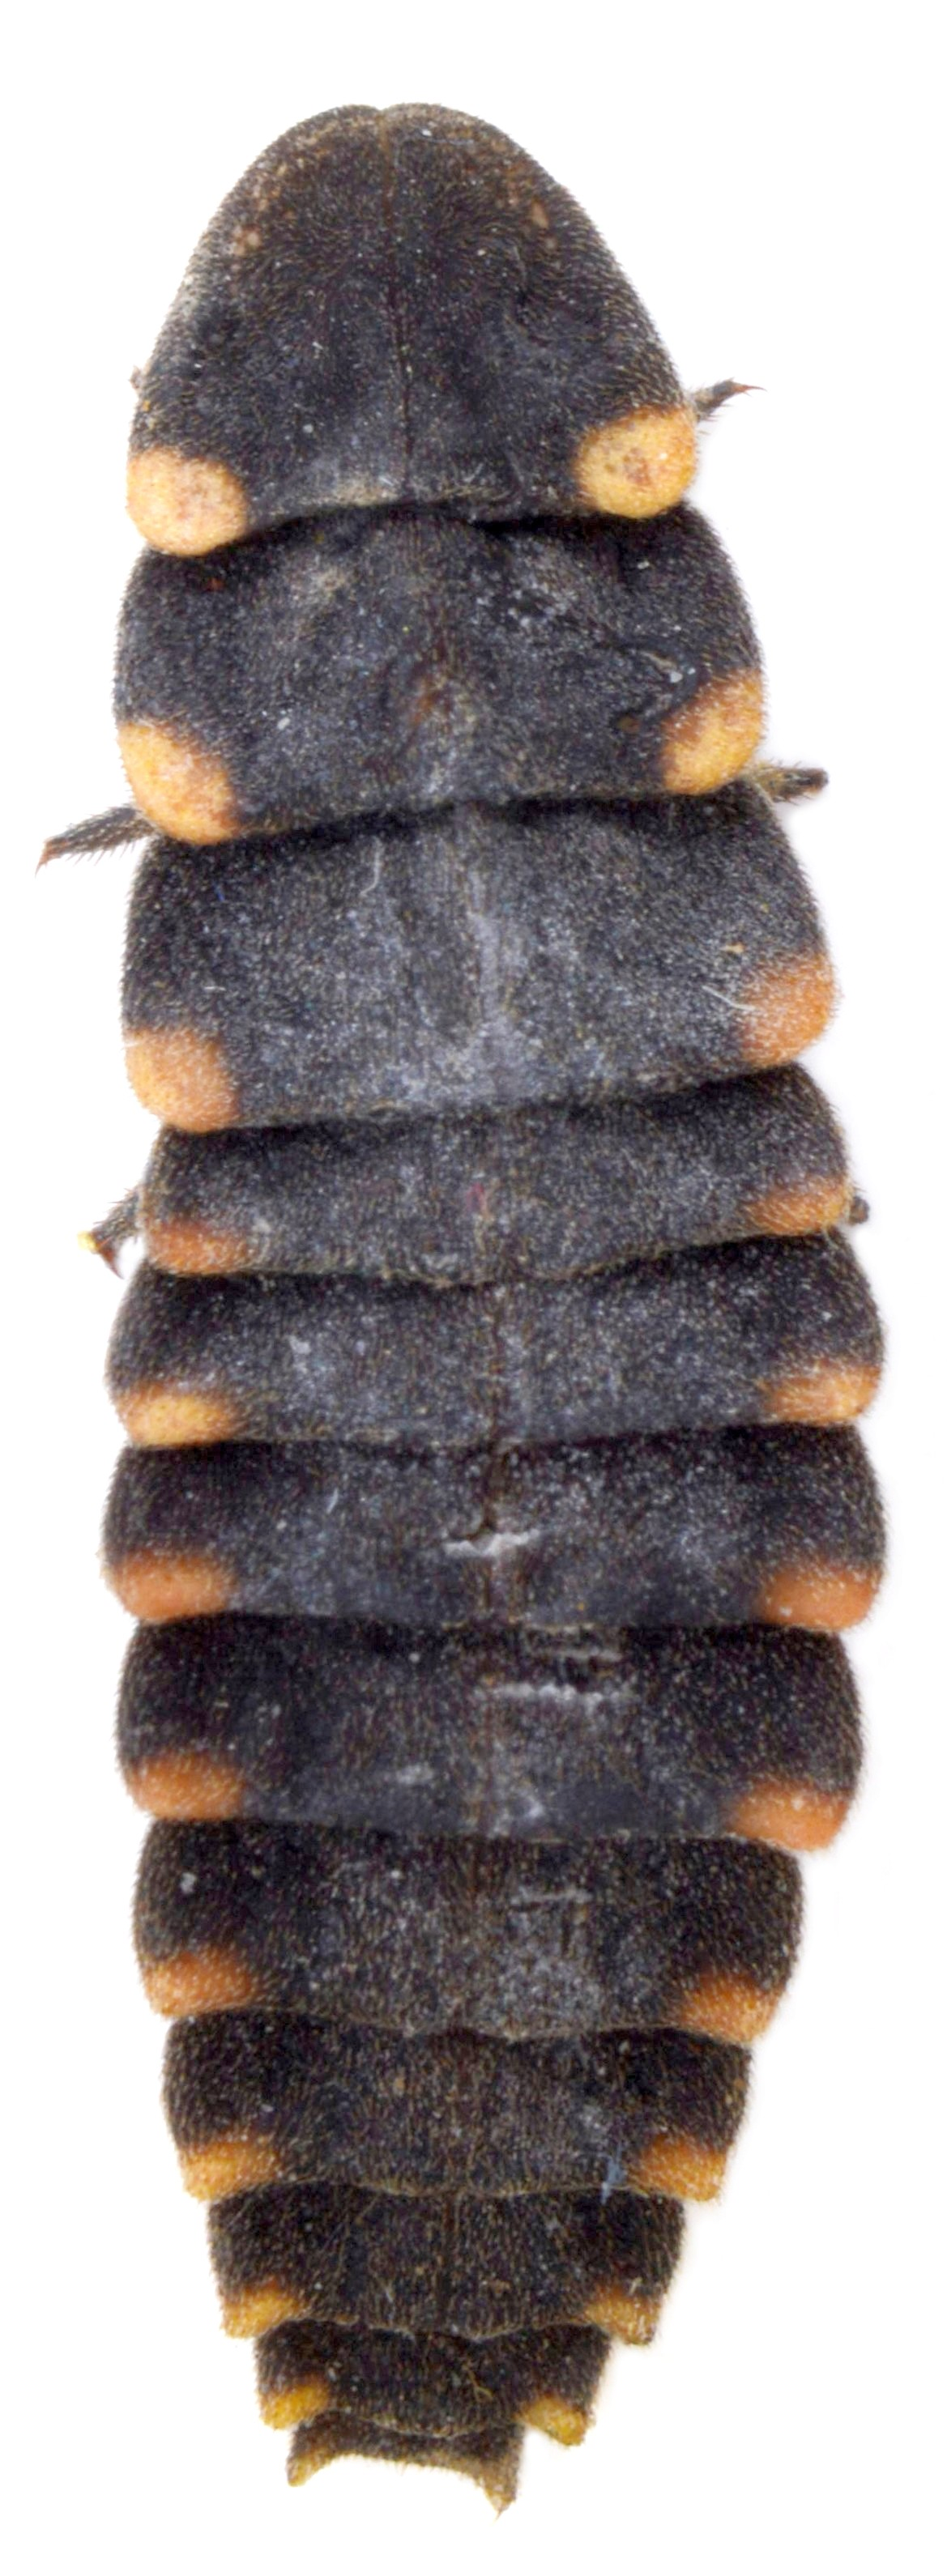 Lampyris noctiluca larva